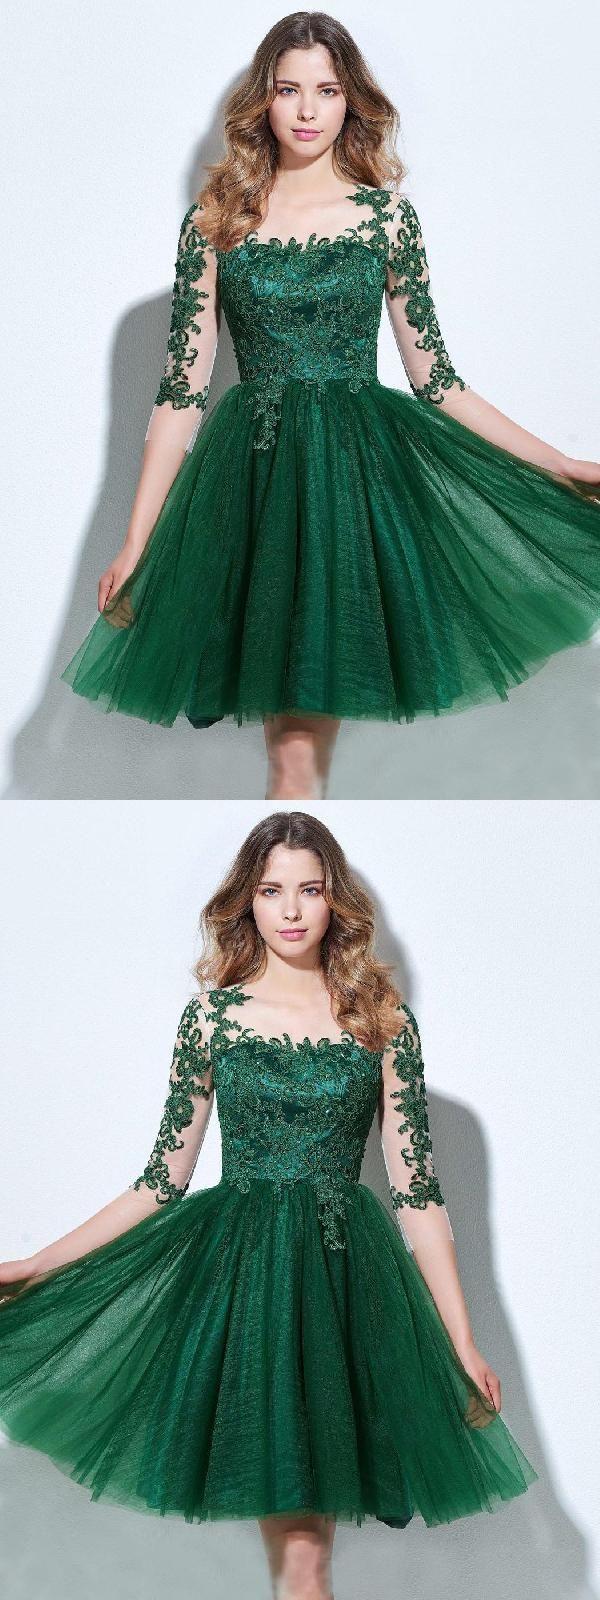 Aline green short amy homecoming dresses